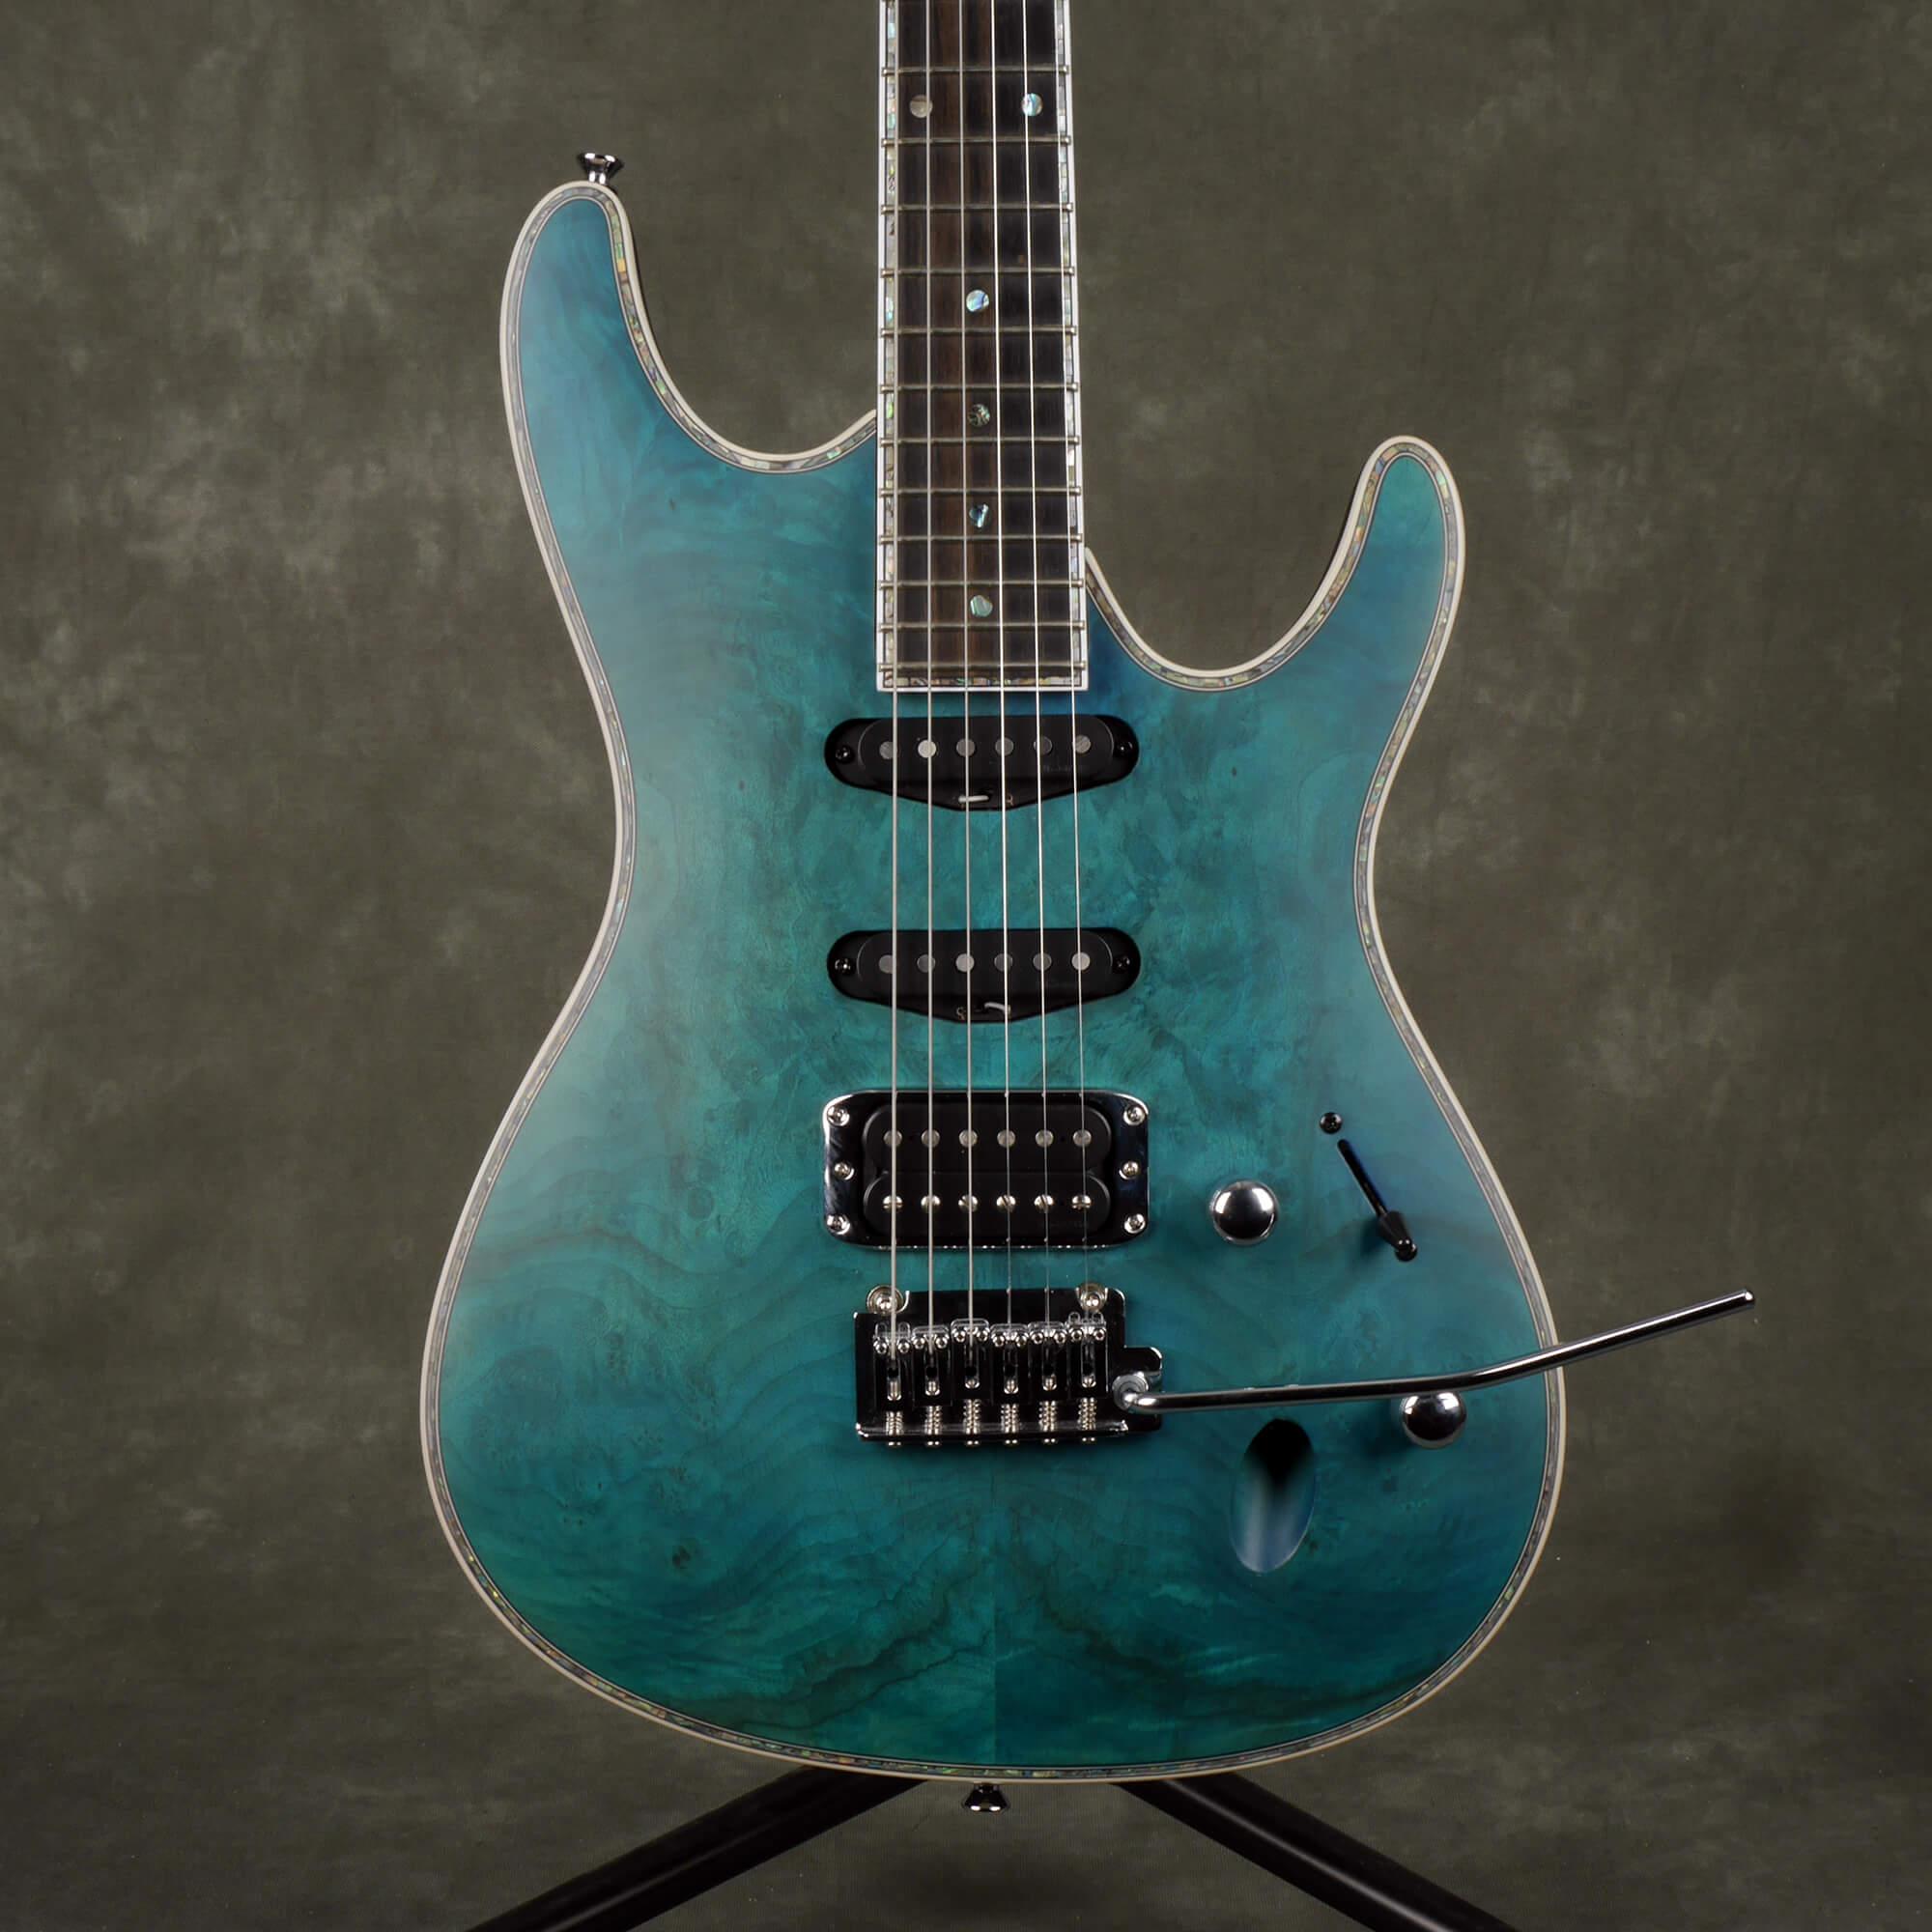 Ibanez SA560MB Electric Guitar - Aqua Blue Flat - 2nd Hand